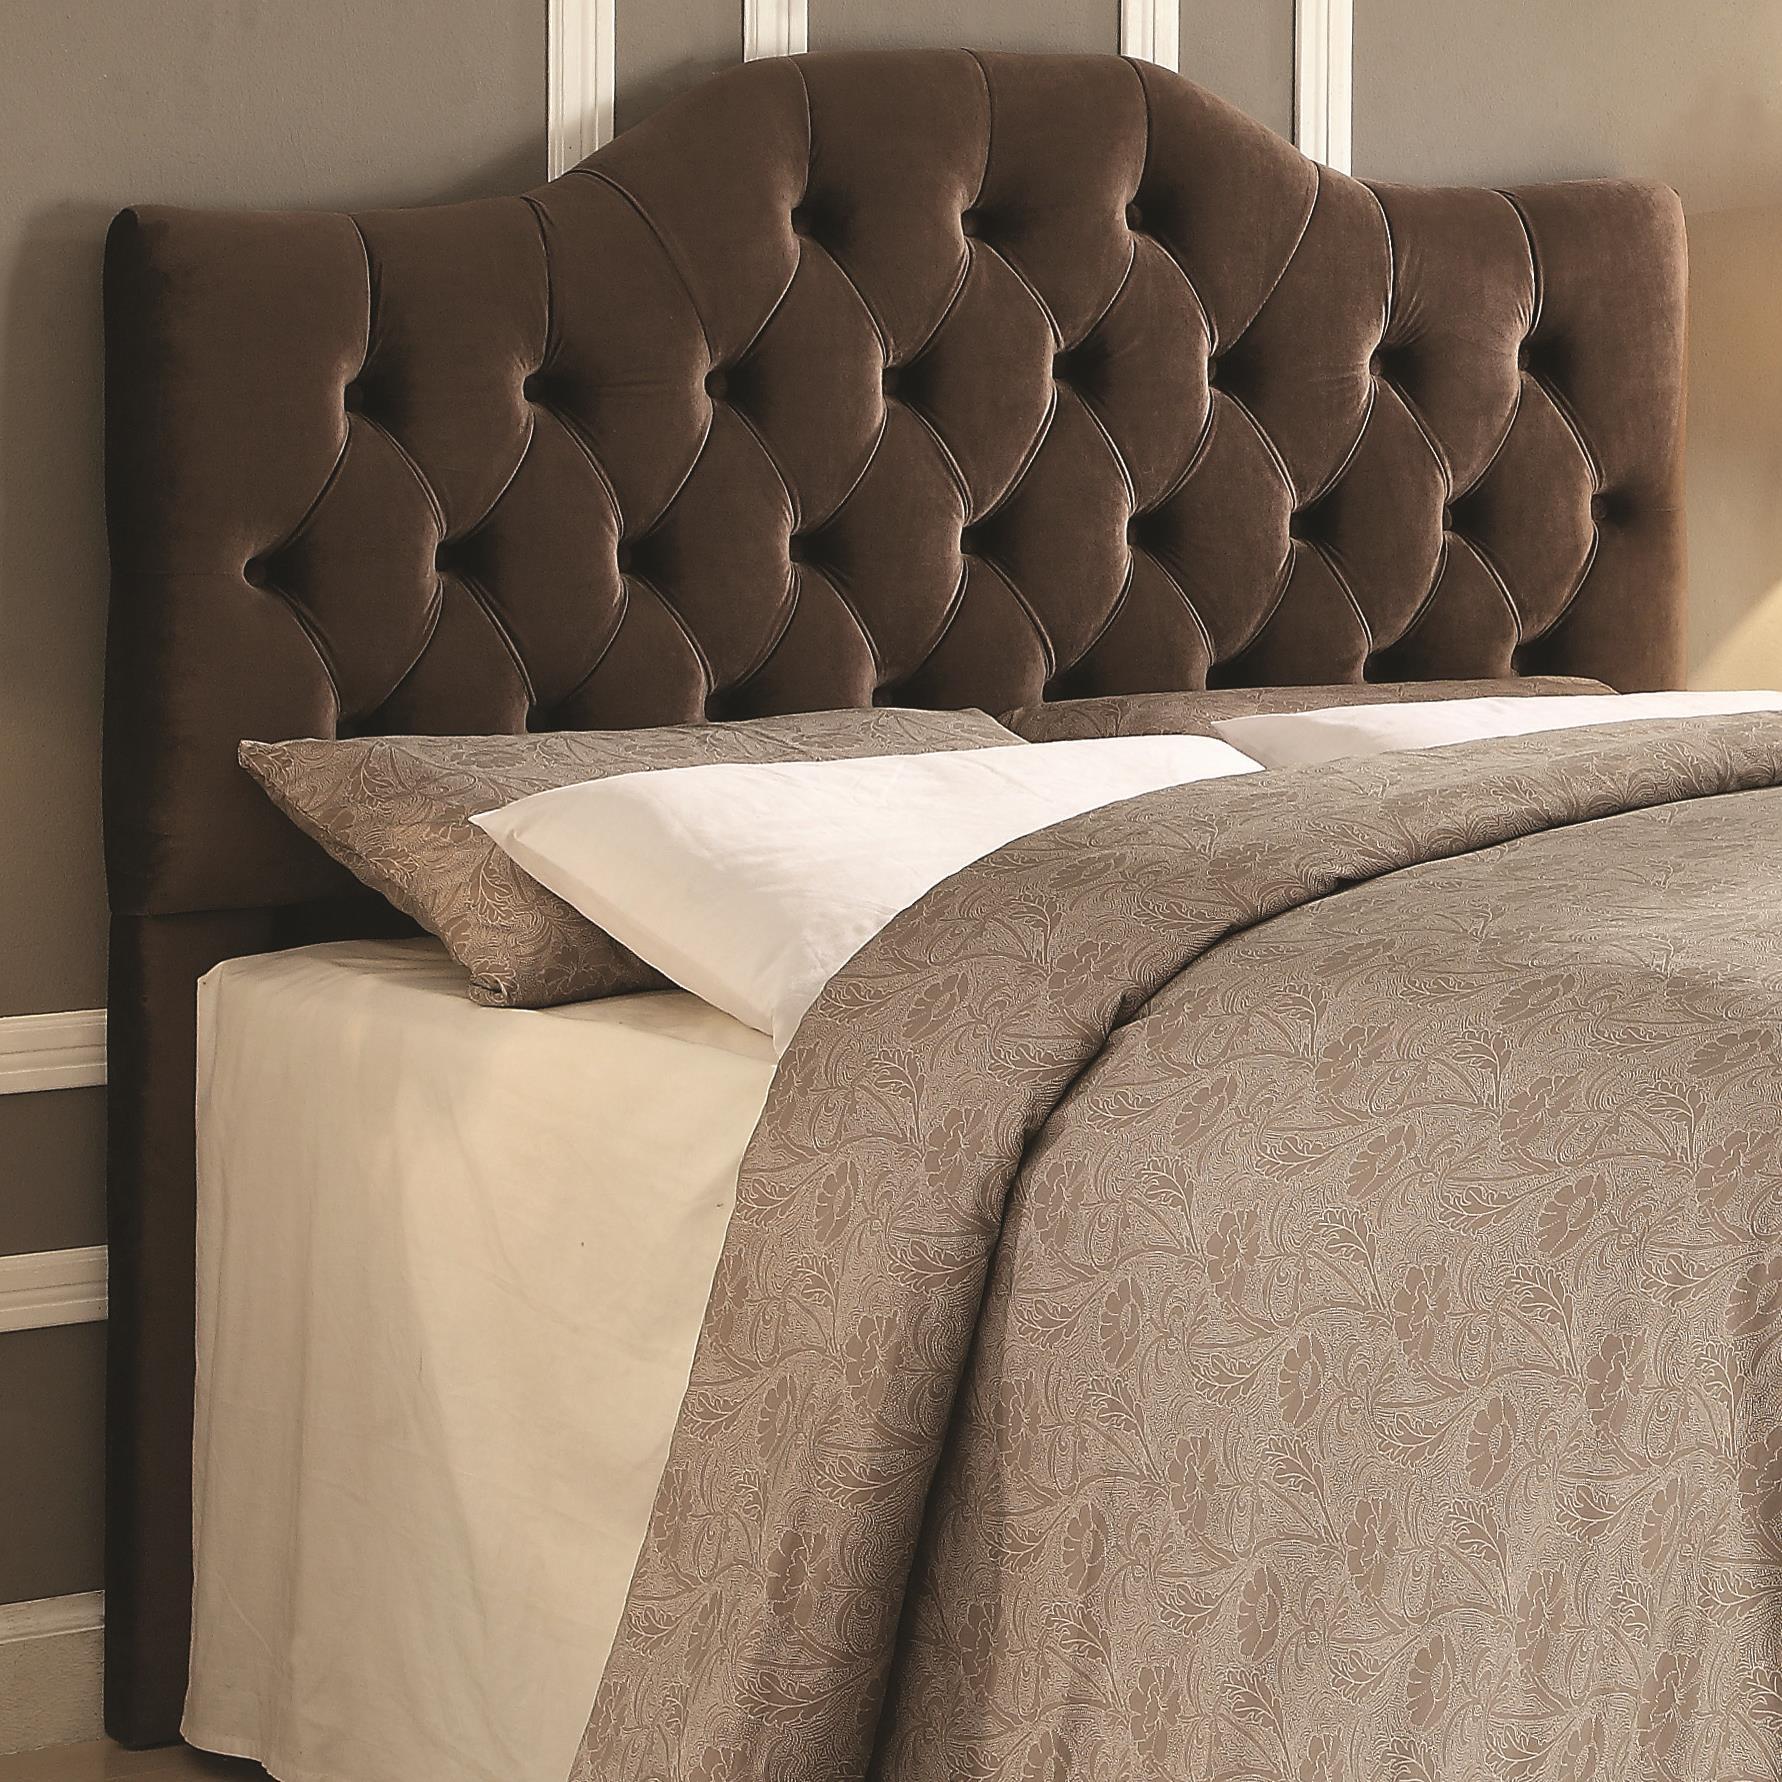 Coaster Headingley Upholstered King/Cali King Headboard - Item Number: 300533K